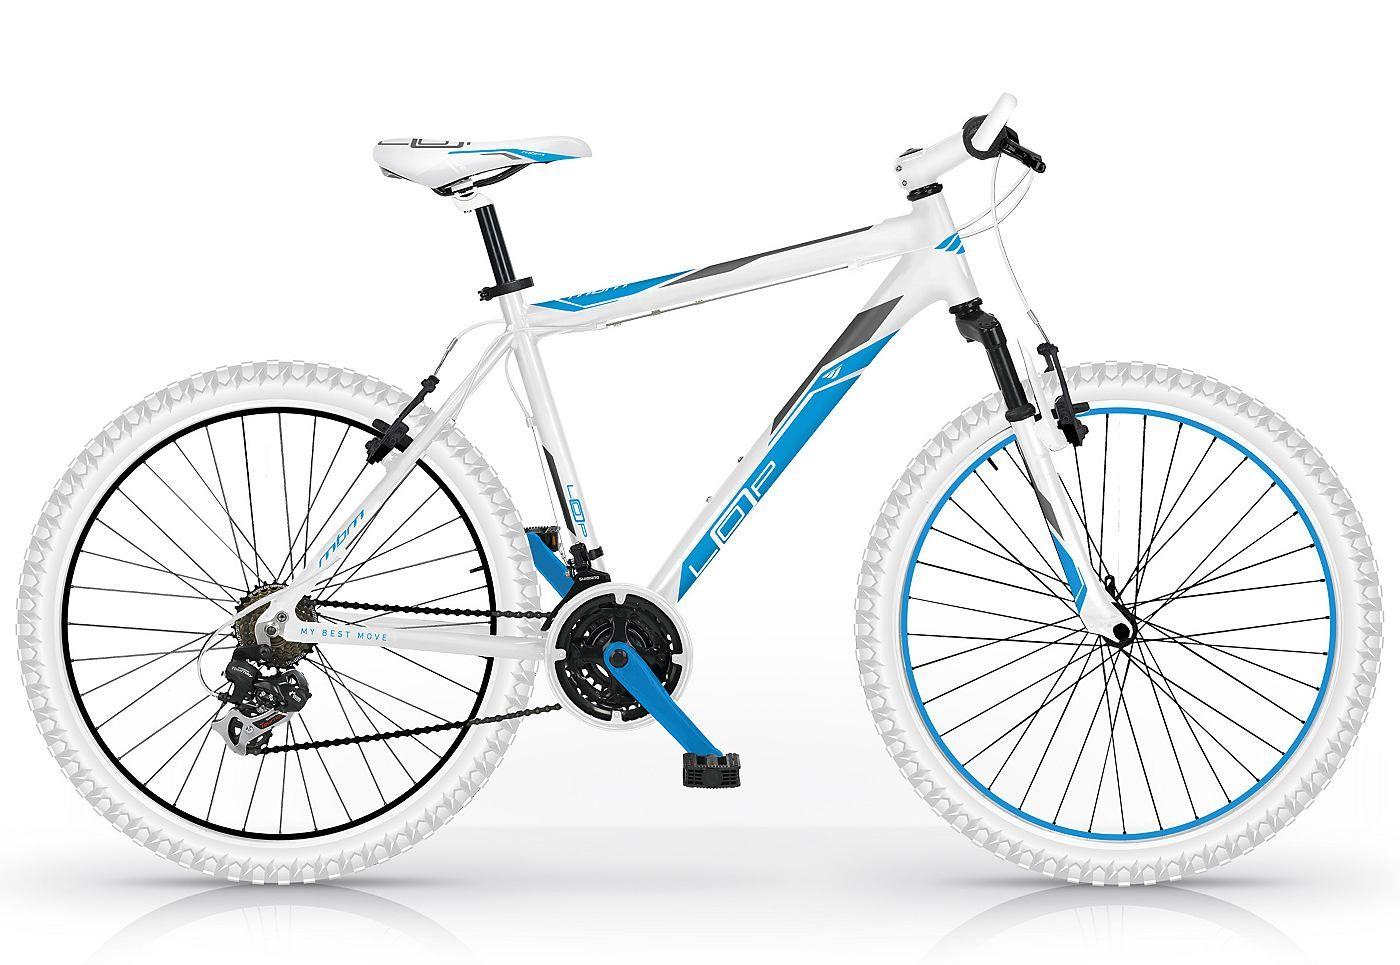 Herren Mountainbike, 26 Zoll, weiß-blau, 21 Gang Shimano, »Loop 653 ...